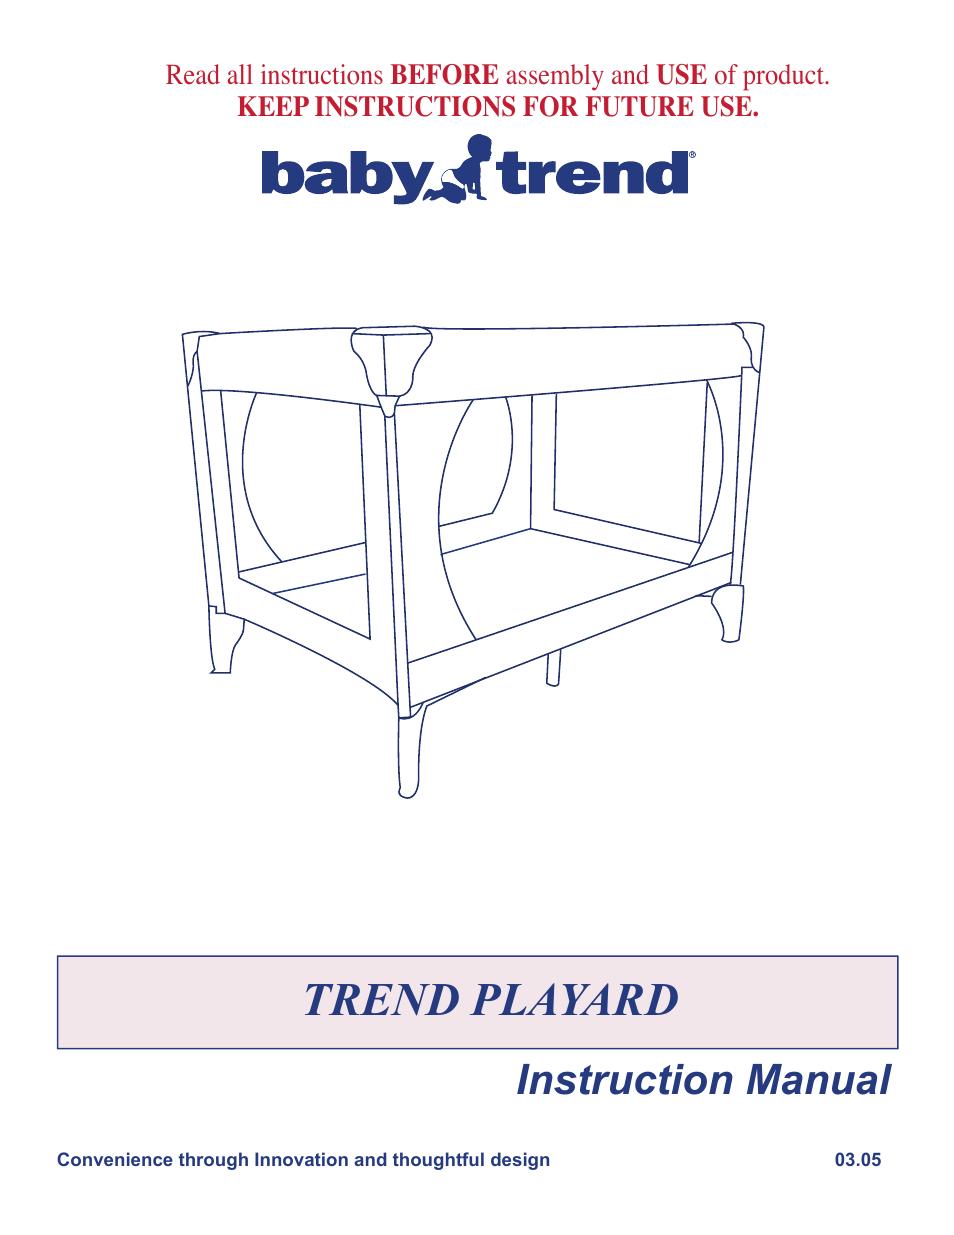 Babytrend 8025 Laurel Oak Play Yard User Manual 5 Pages